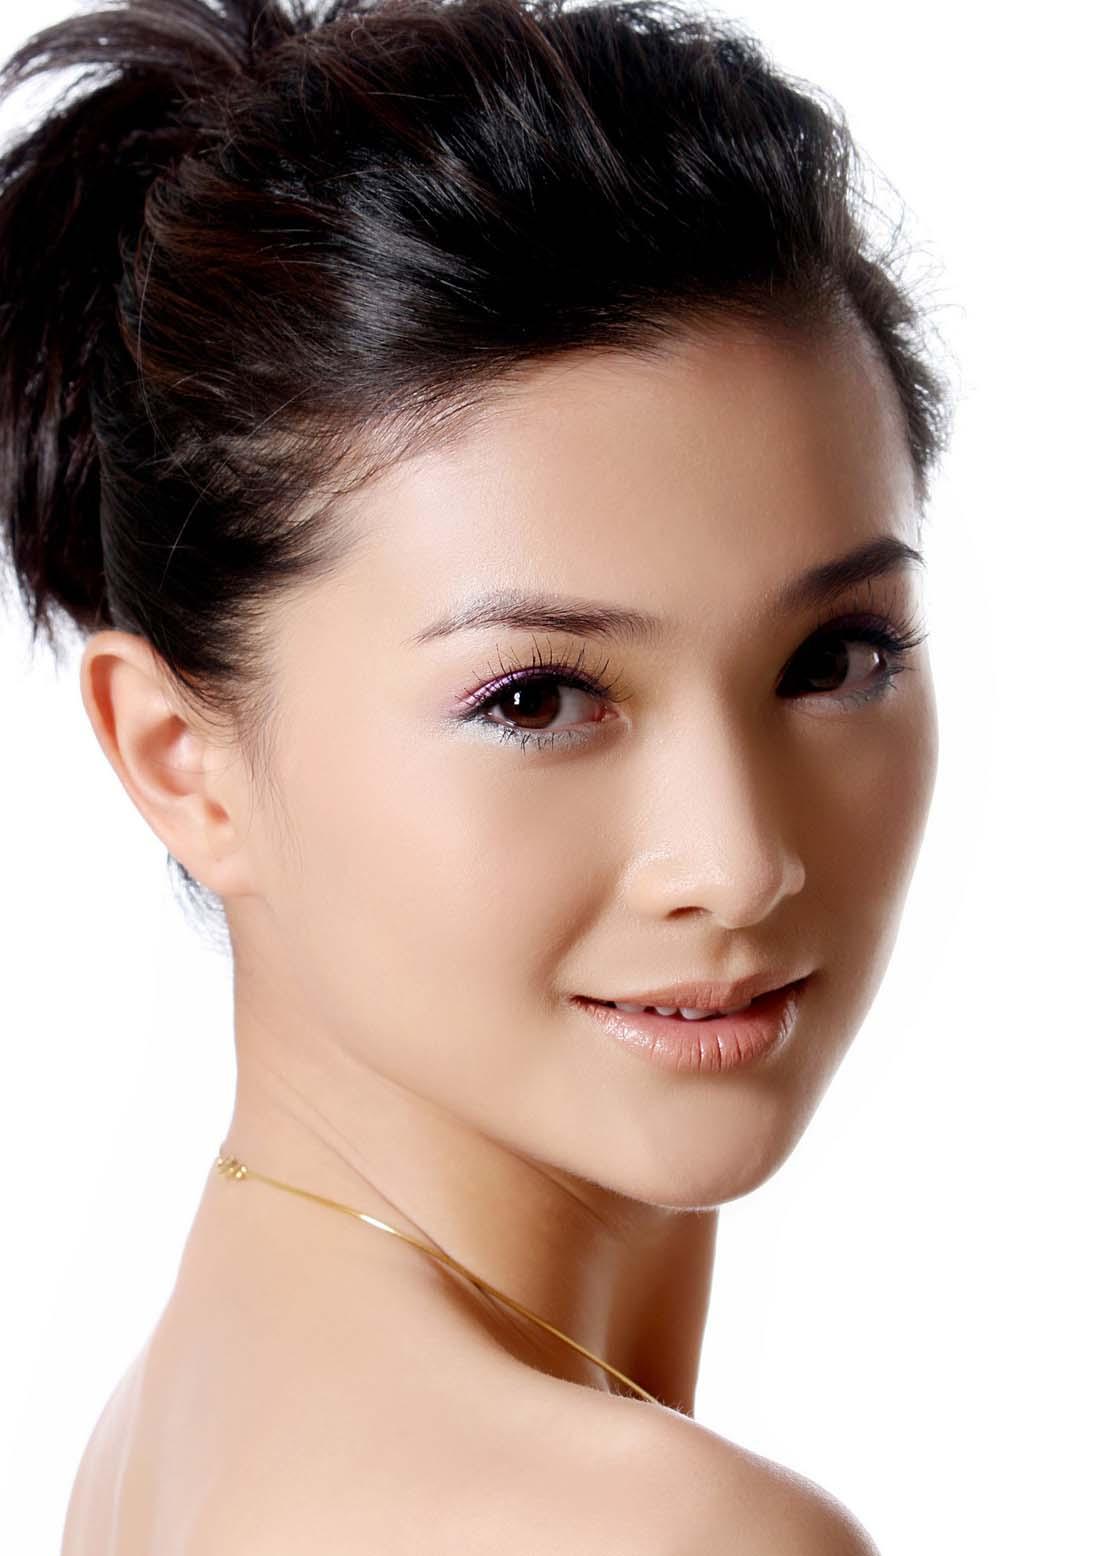 Babes Sexy XxX: Hot Beauty Cute Asian Models actresses